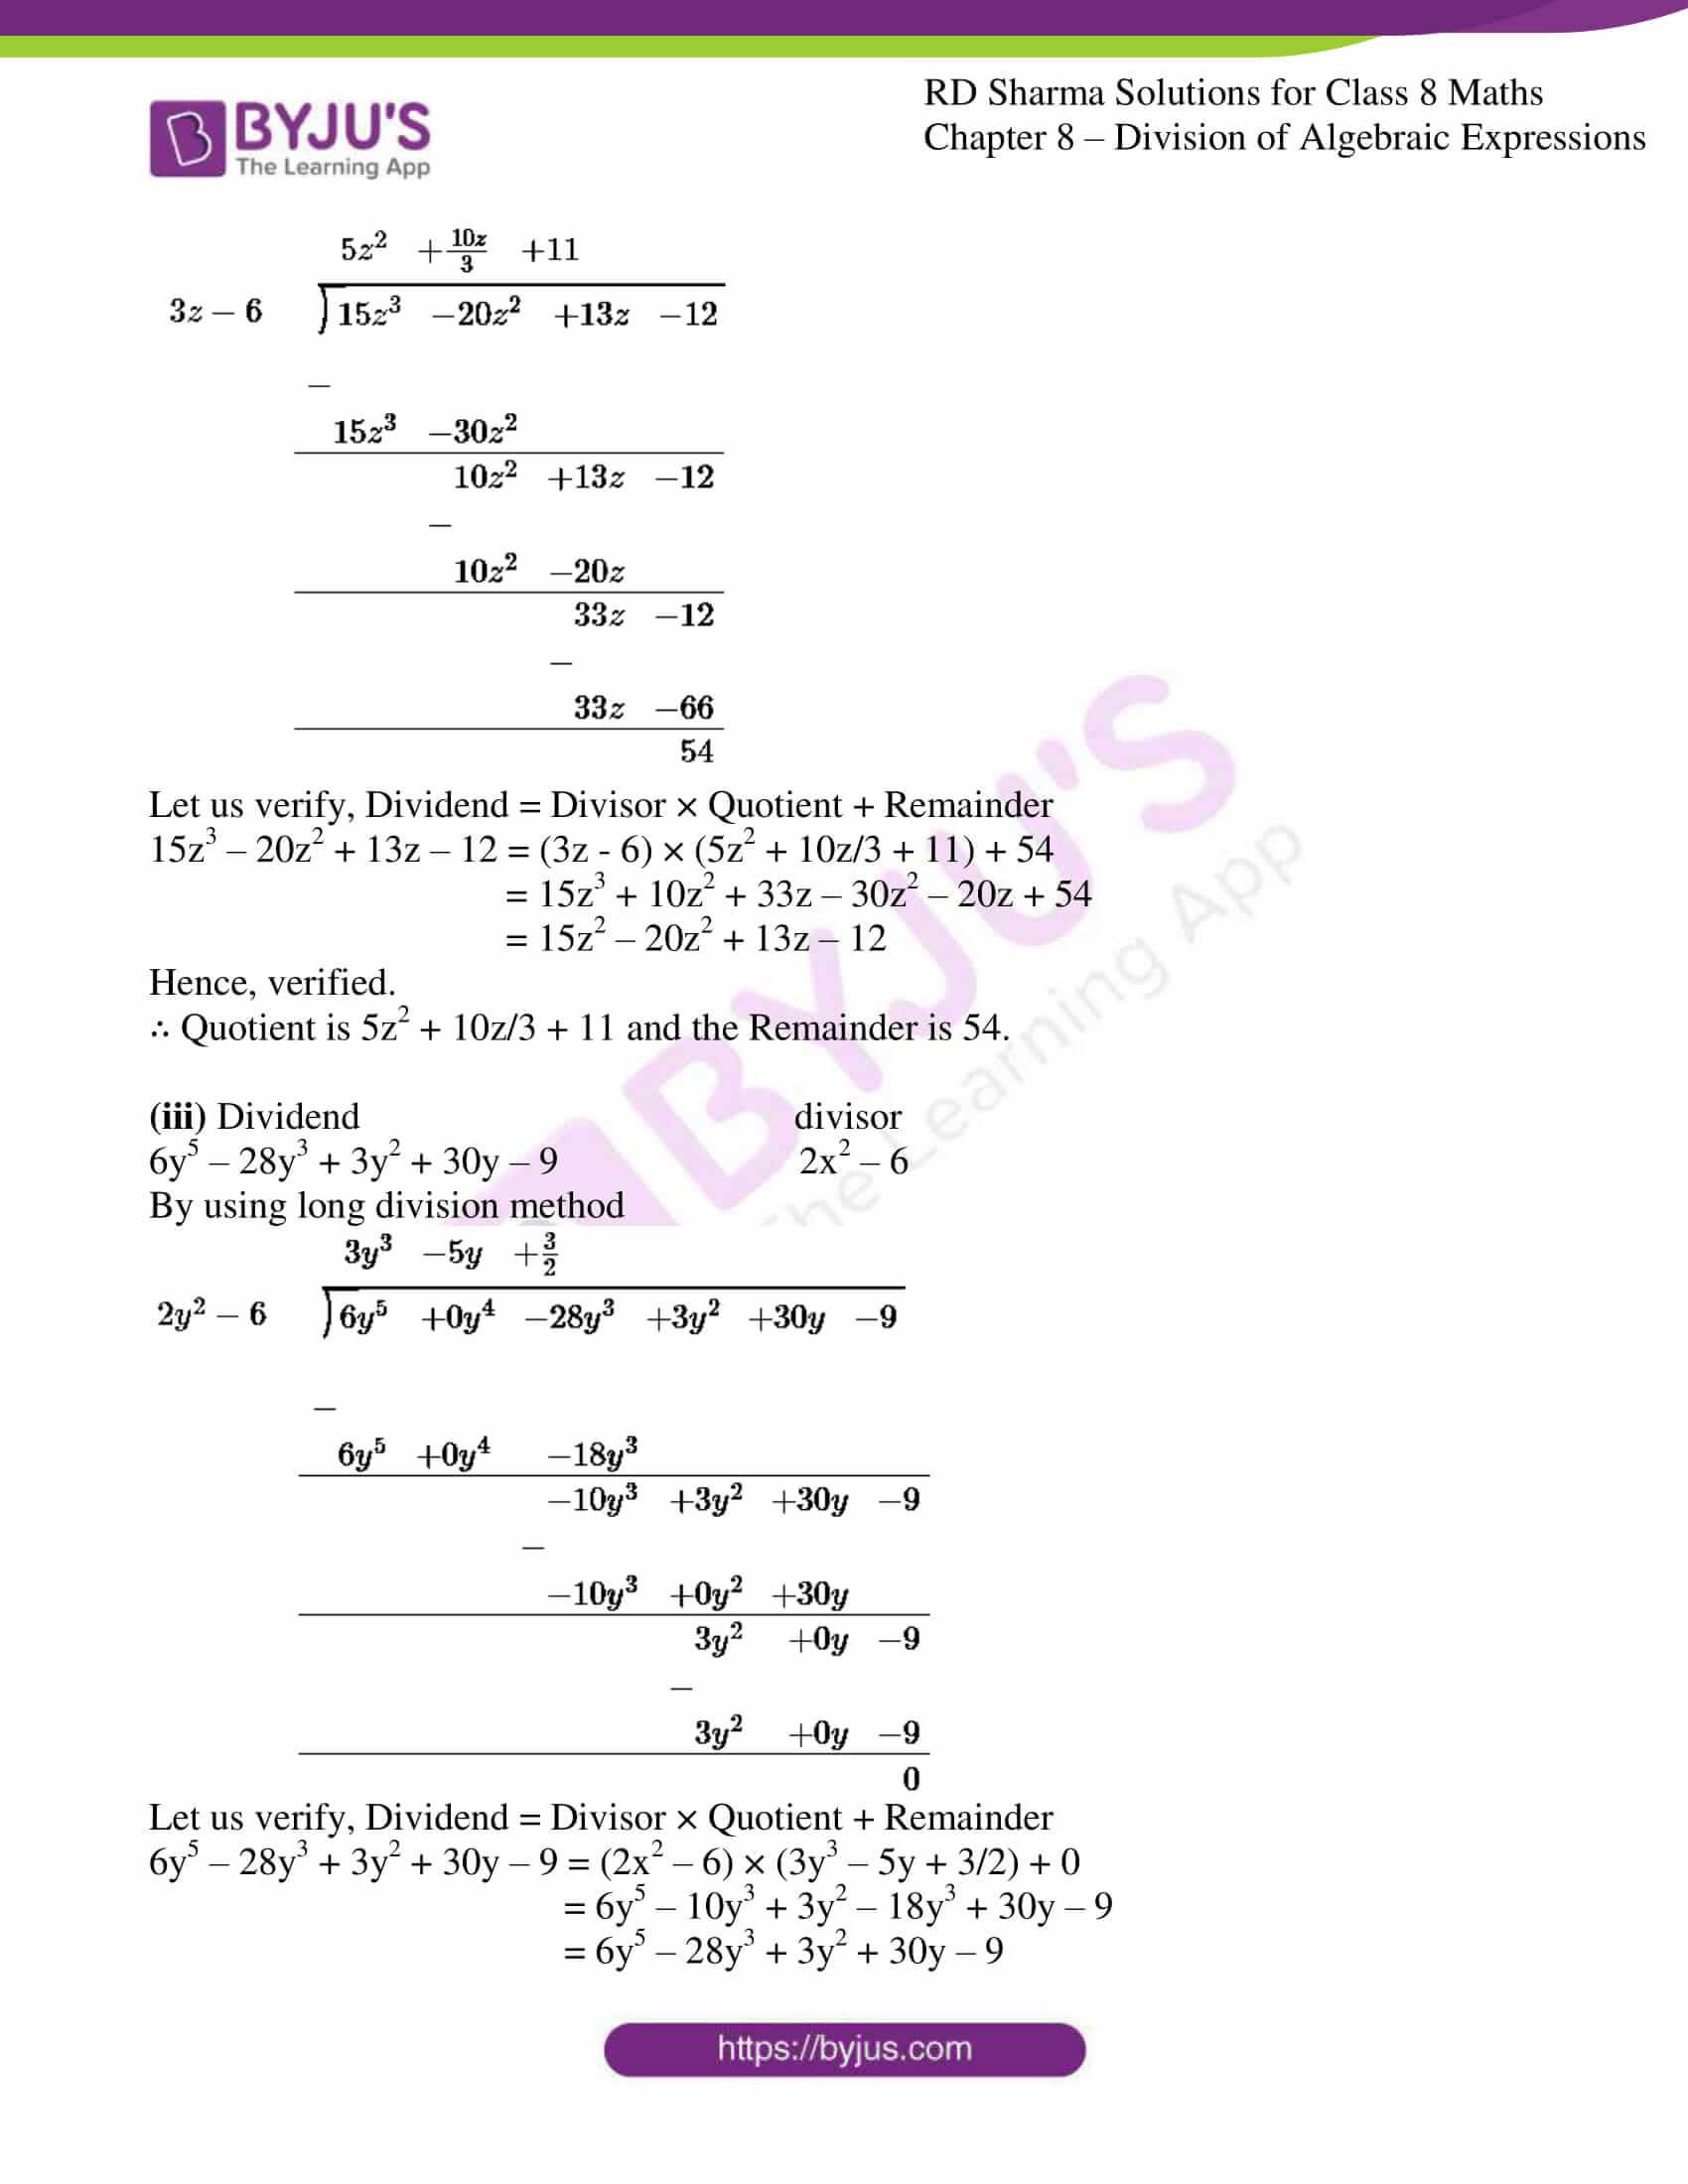 rd sharma class 8 maths chapter 8 exercise 4 11